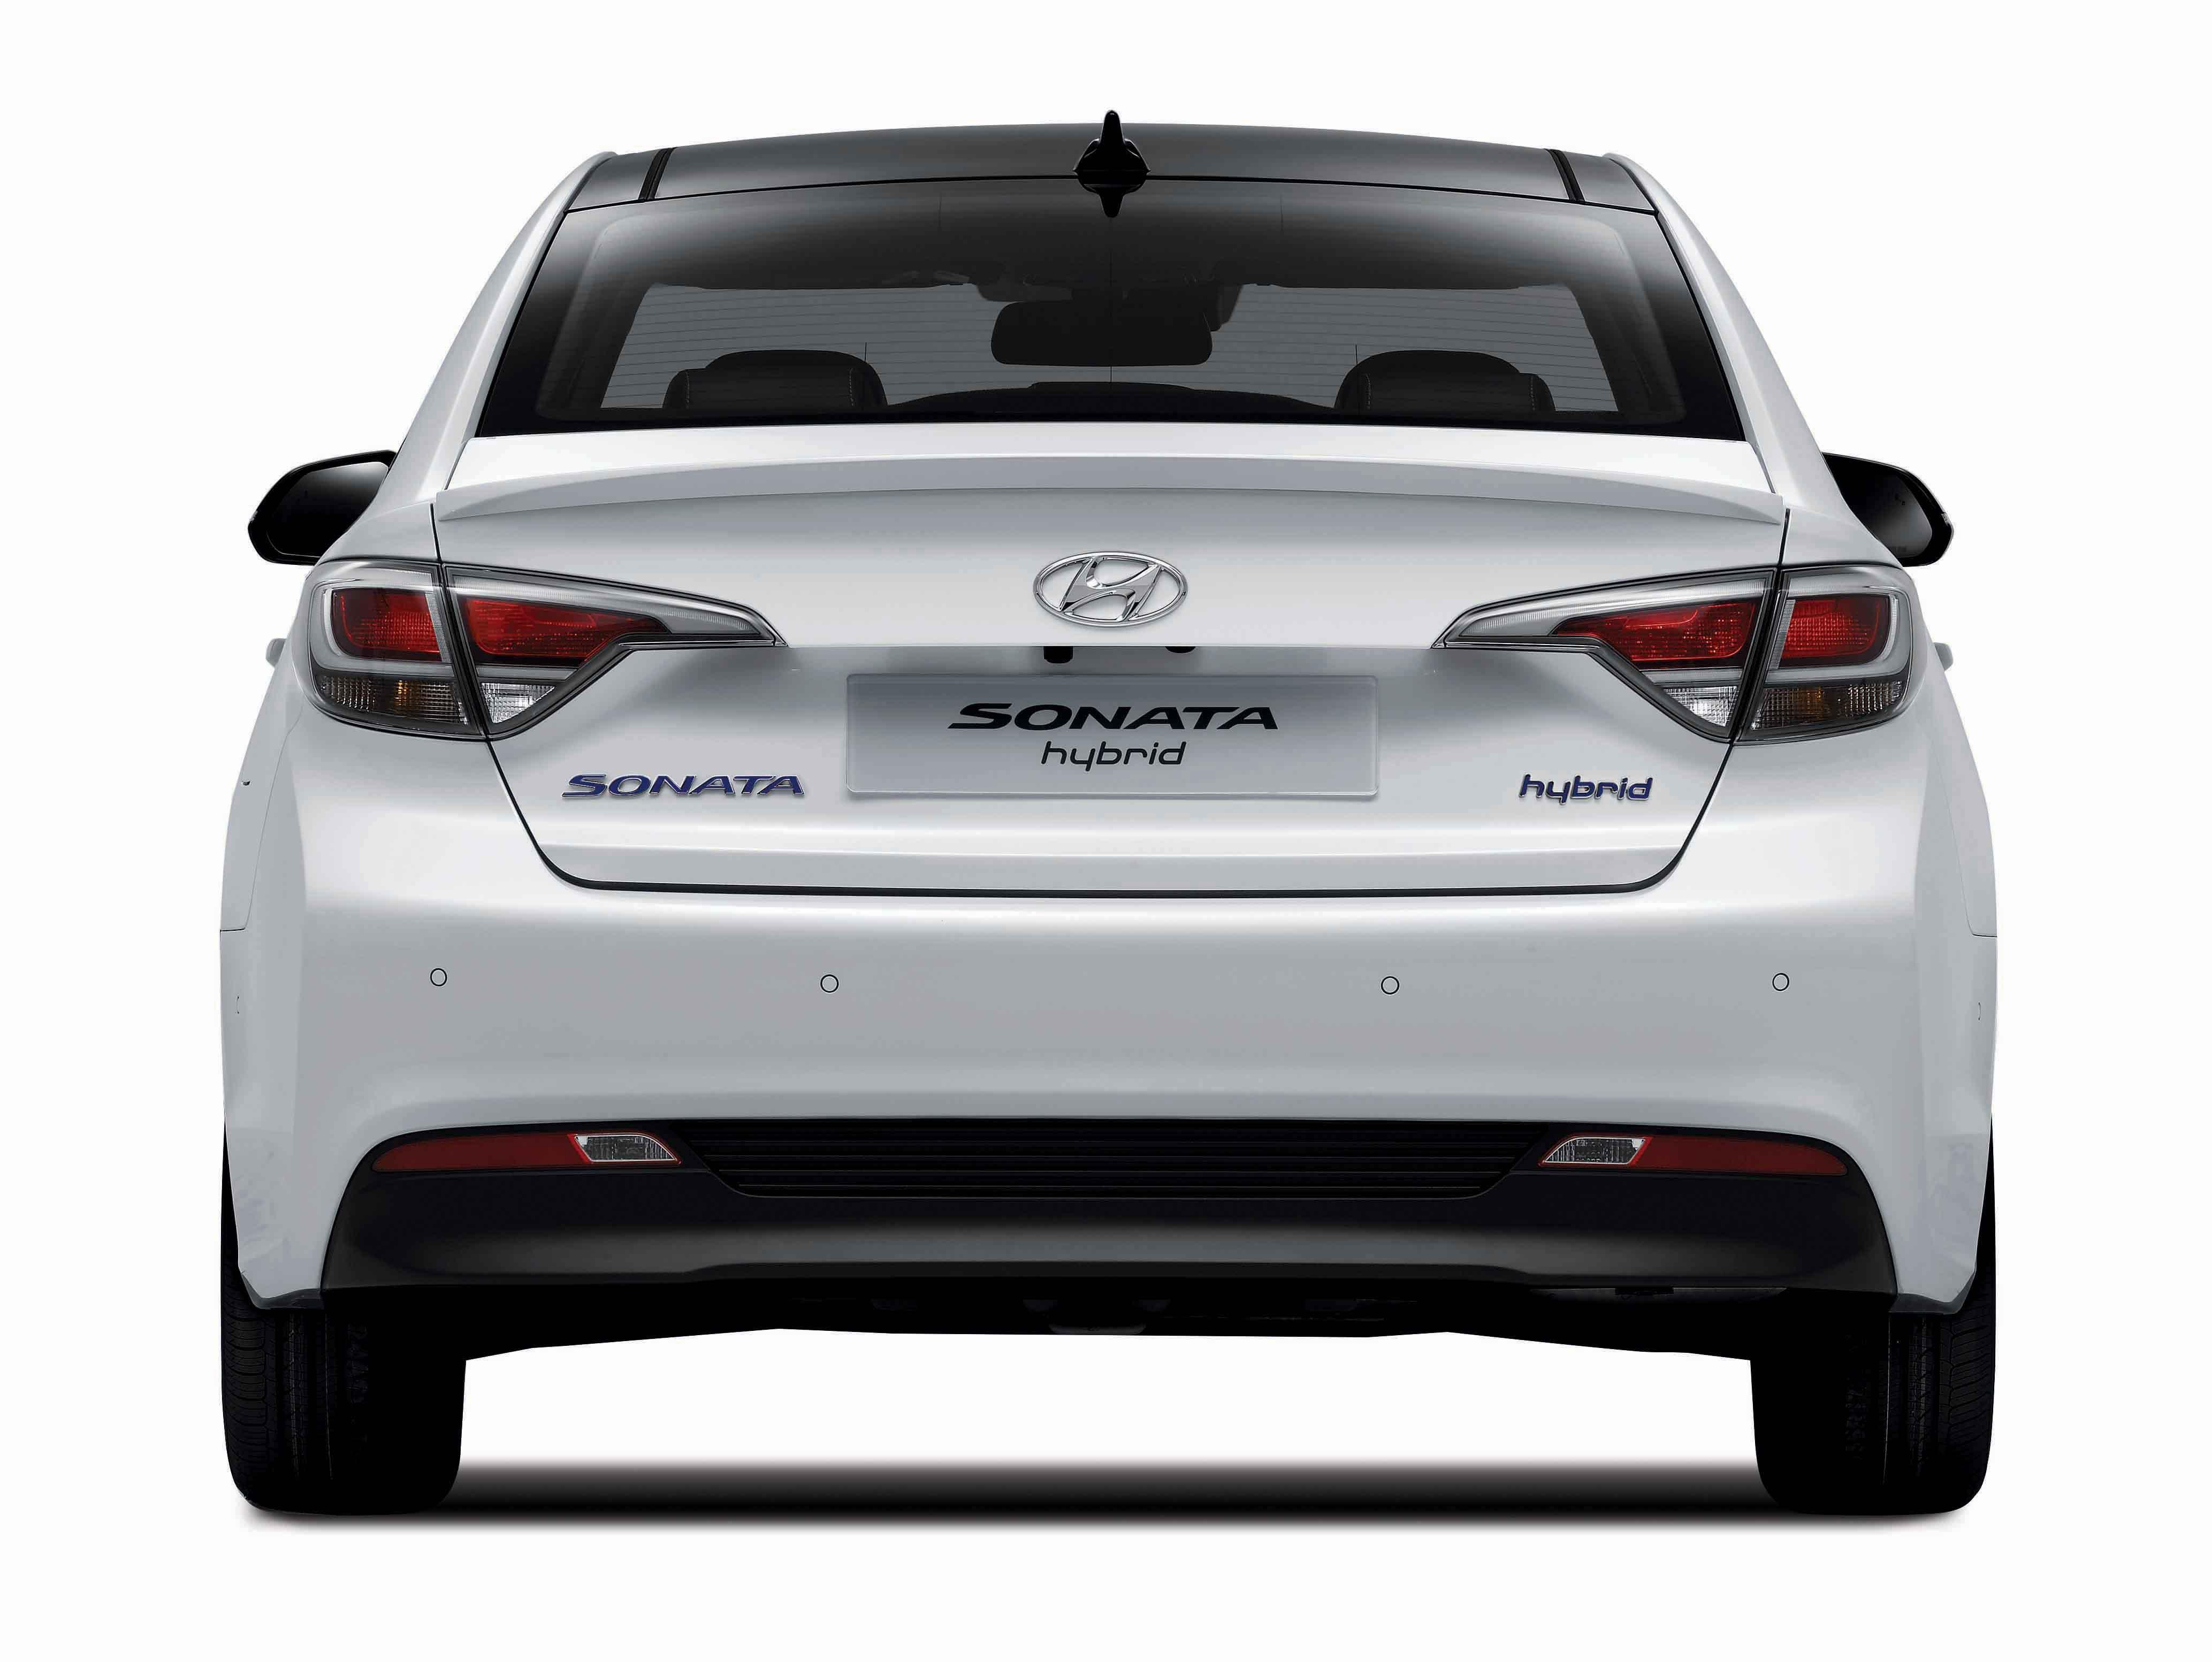 Hyundai Azera 2016 >> 2016 Hyundai Sonata Hybrid Previewed at Launch Event in ...